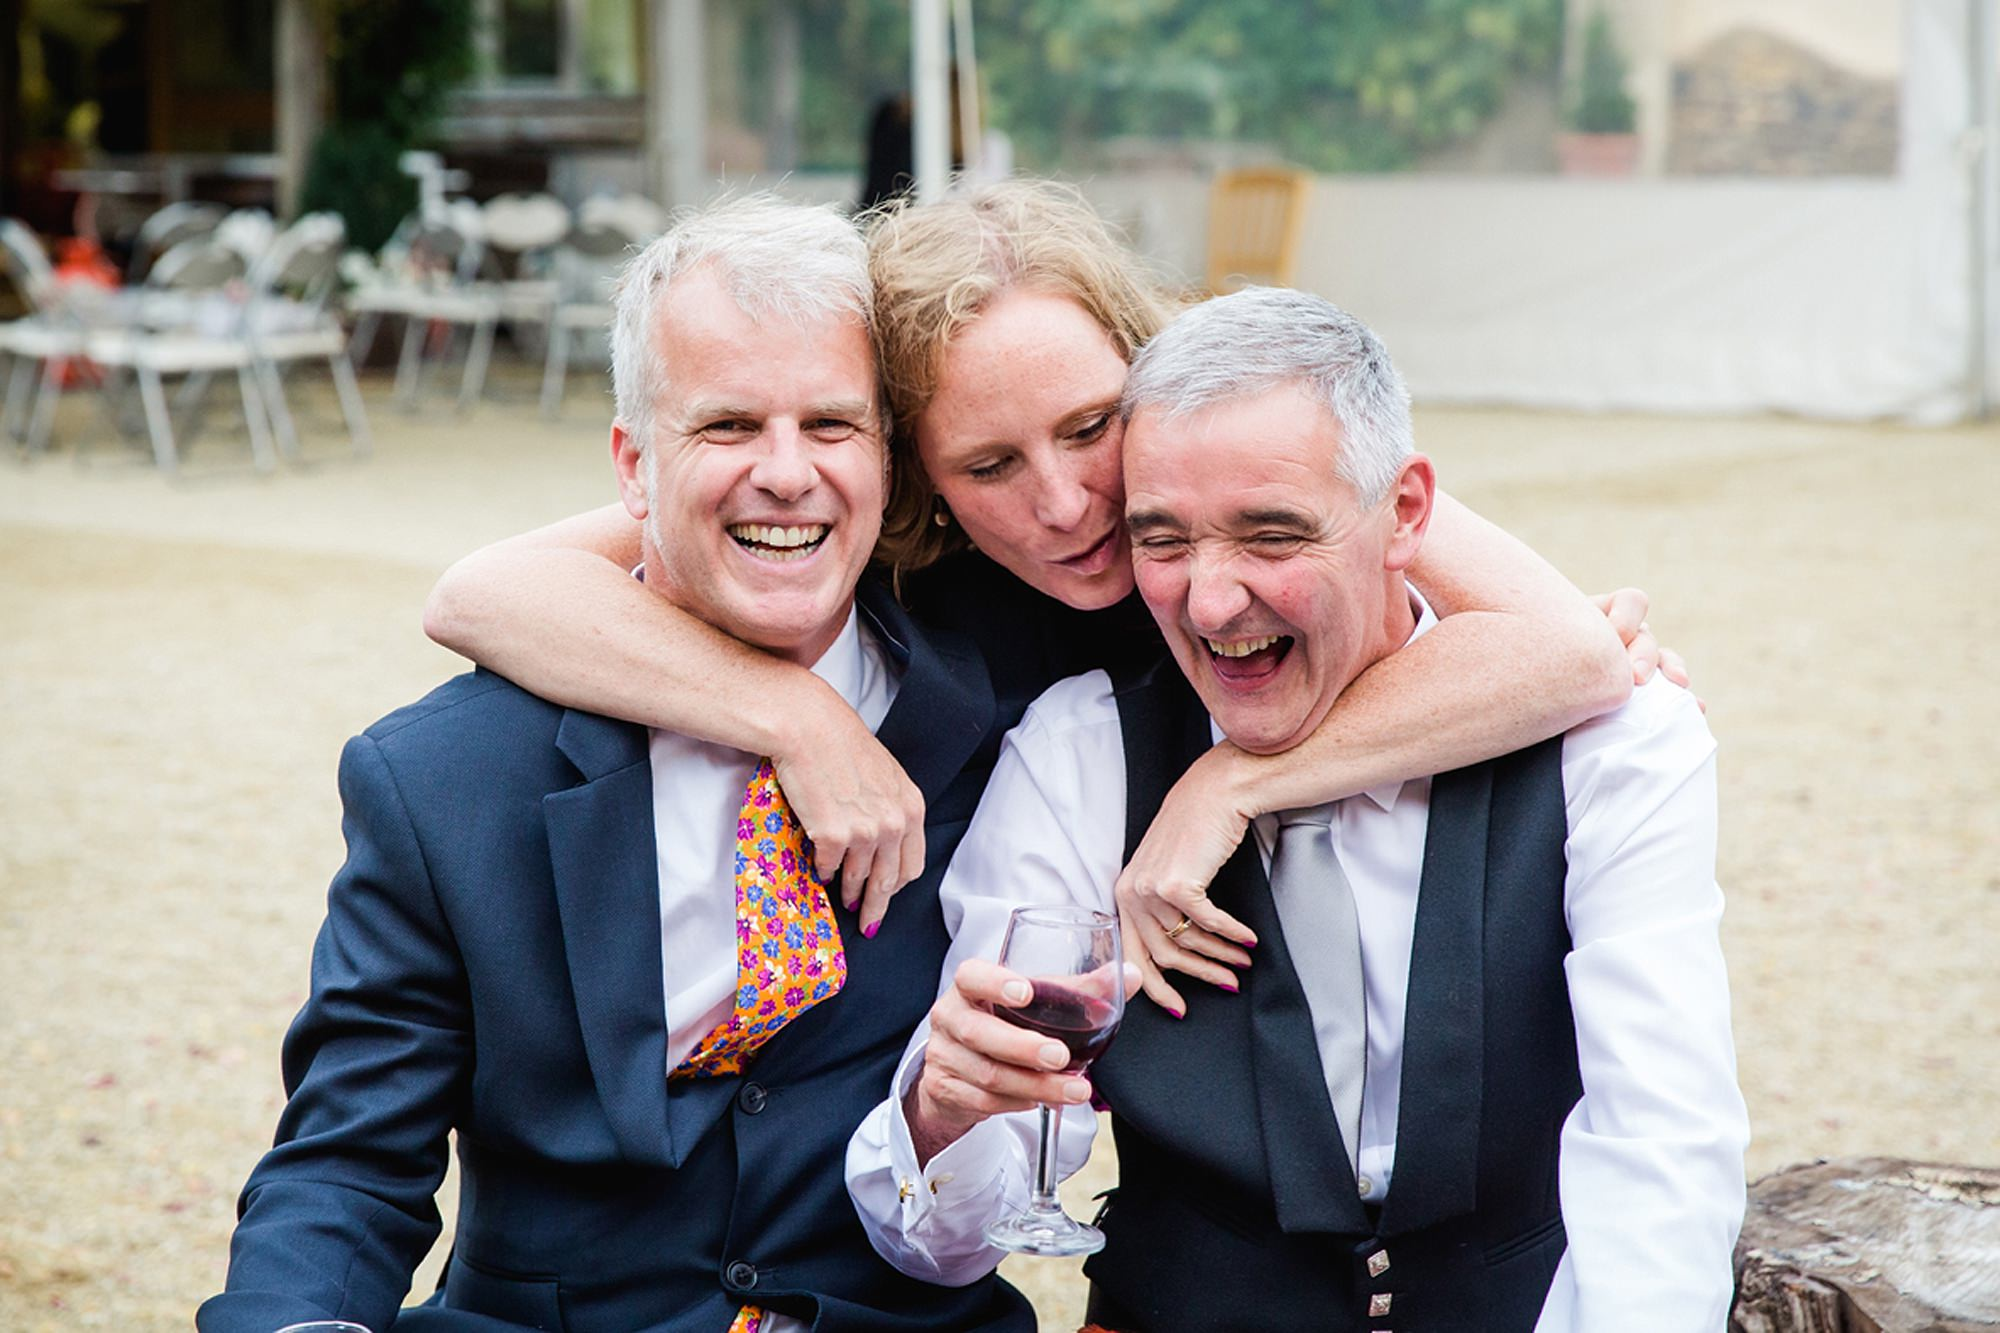 outdoor humanist wedding photography fun guest portrait